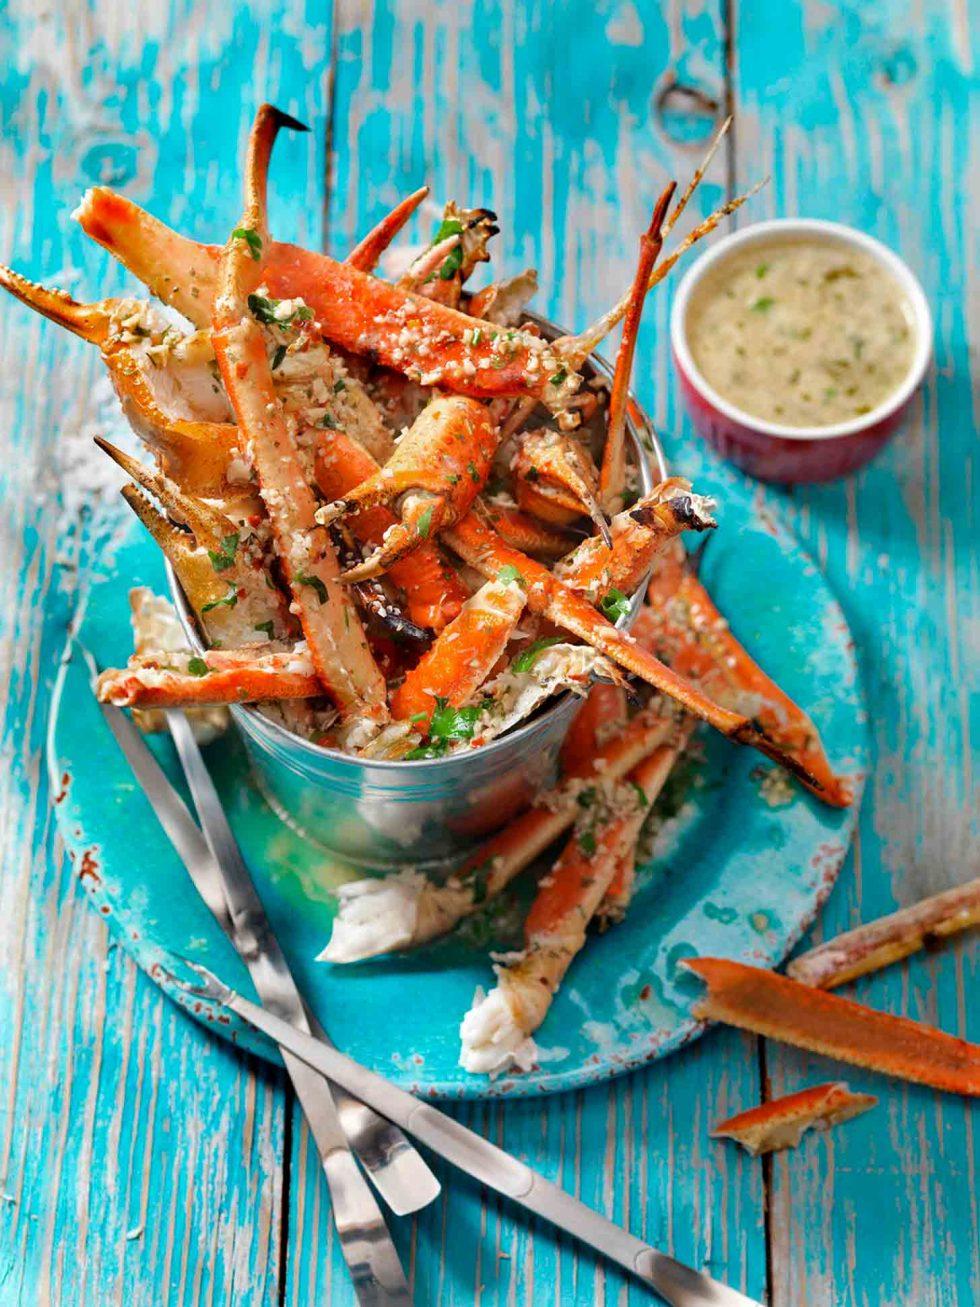 Calgary Food Photography. Seasoned display of crab legs on light blue backdrop.